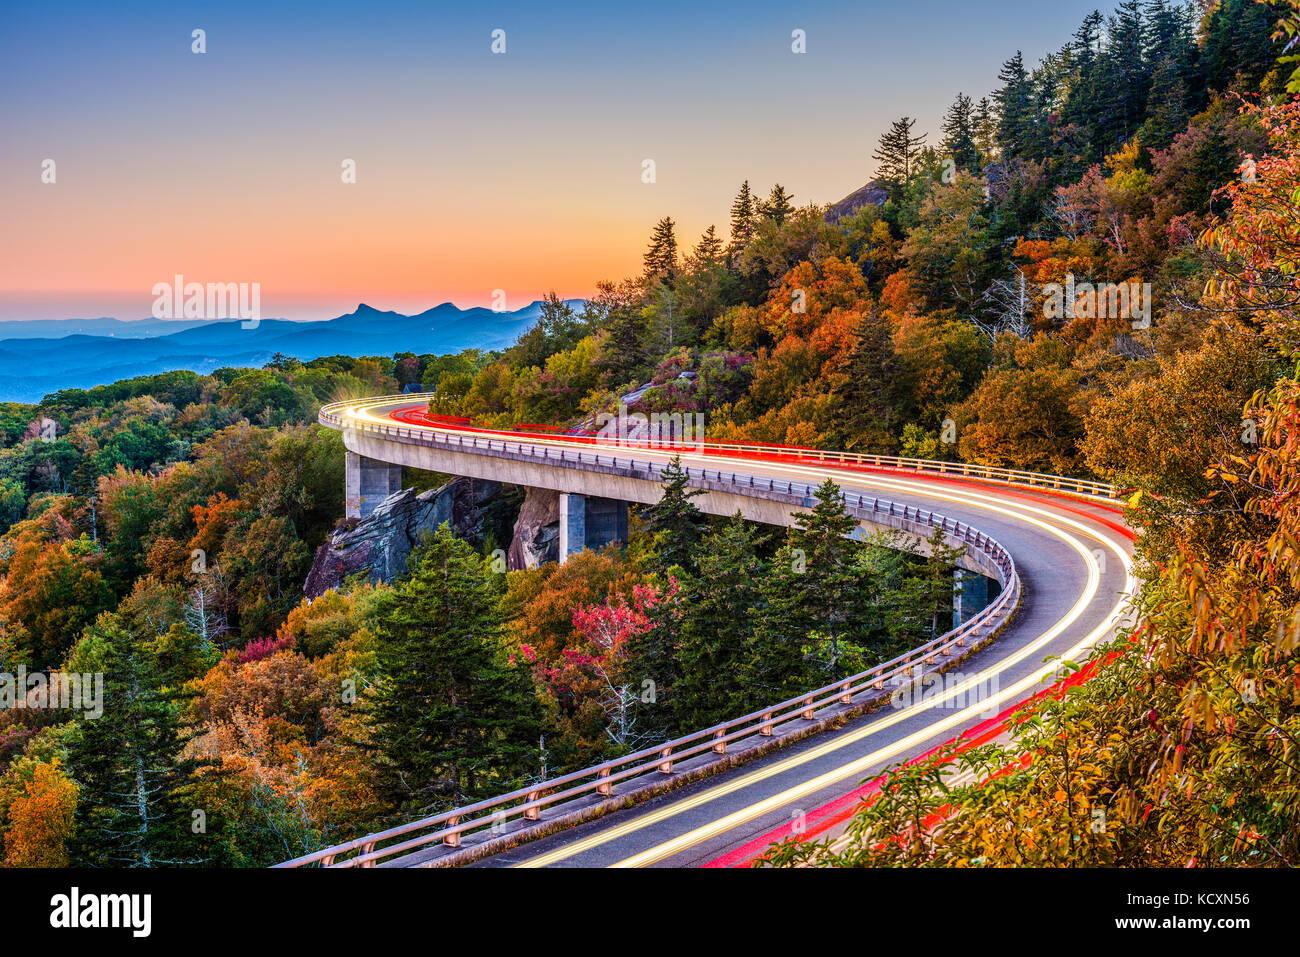 Linn cove viaduc, grandfather mountain, North Carolina, USA. Banque D'Images